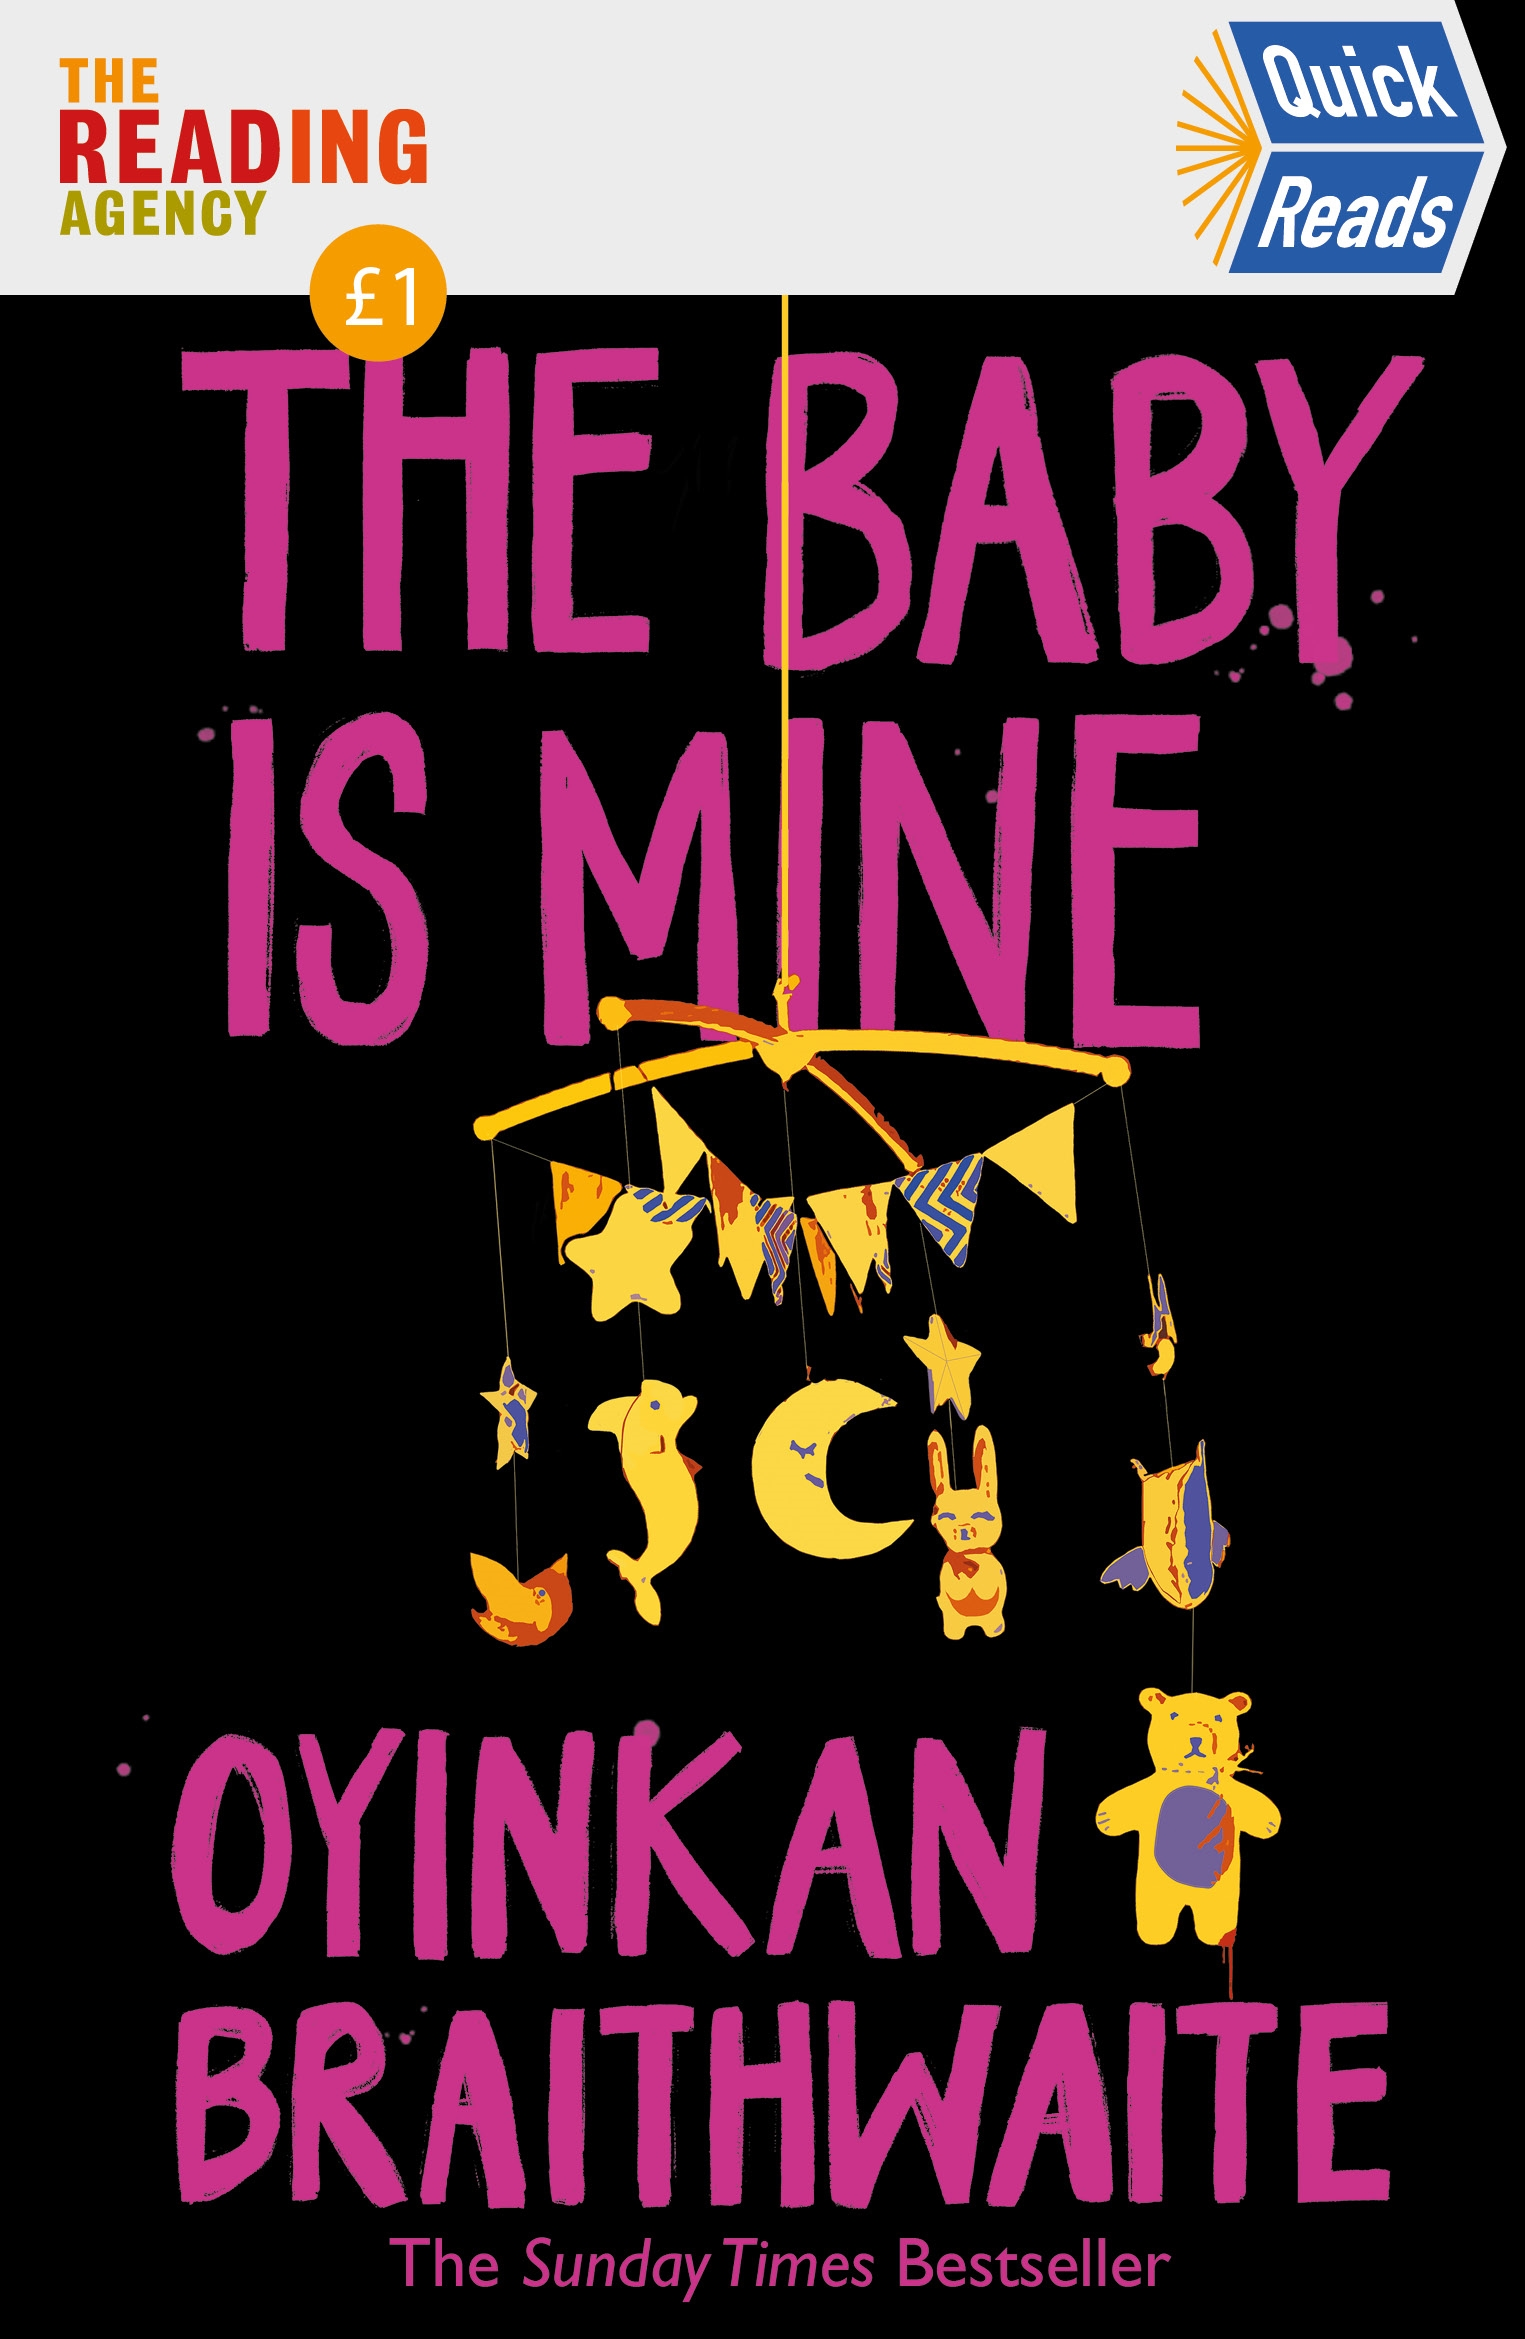 The Baby Is Mine by Oyinkan Braithwaite